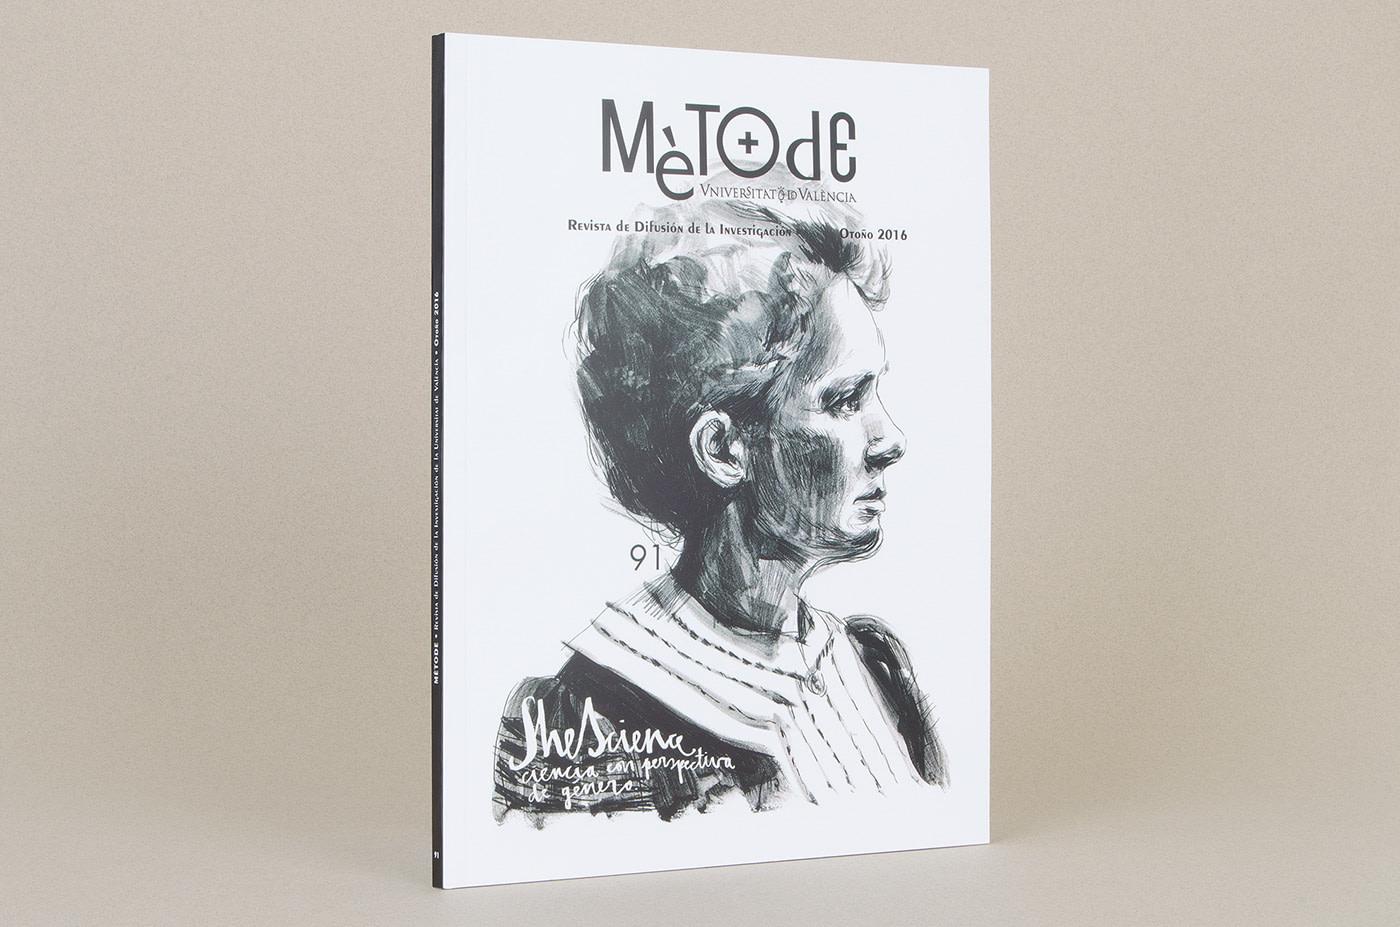 Revista Mètode - UPV